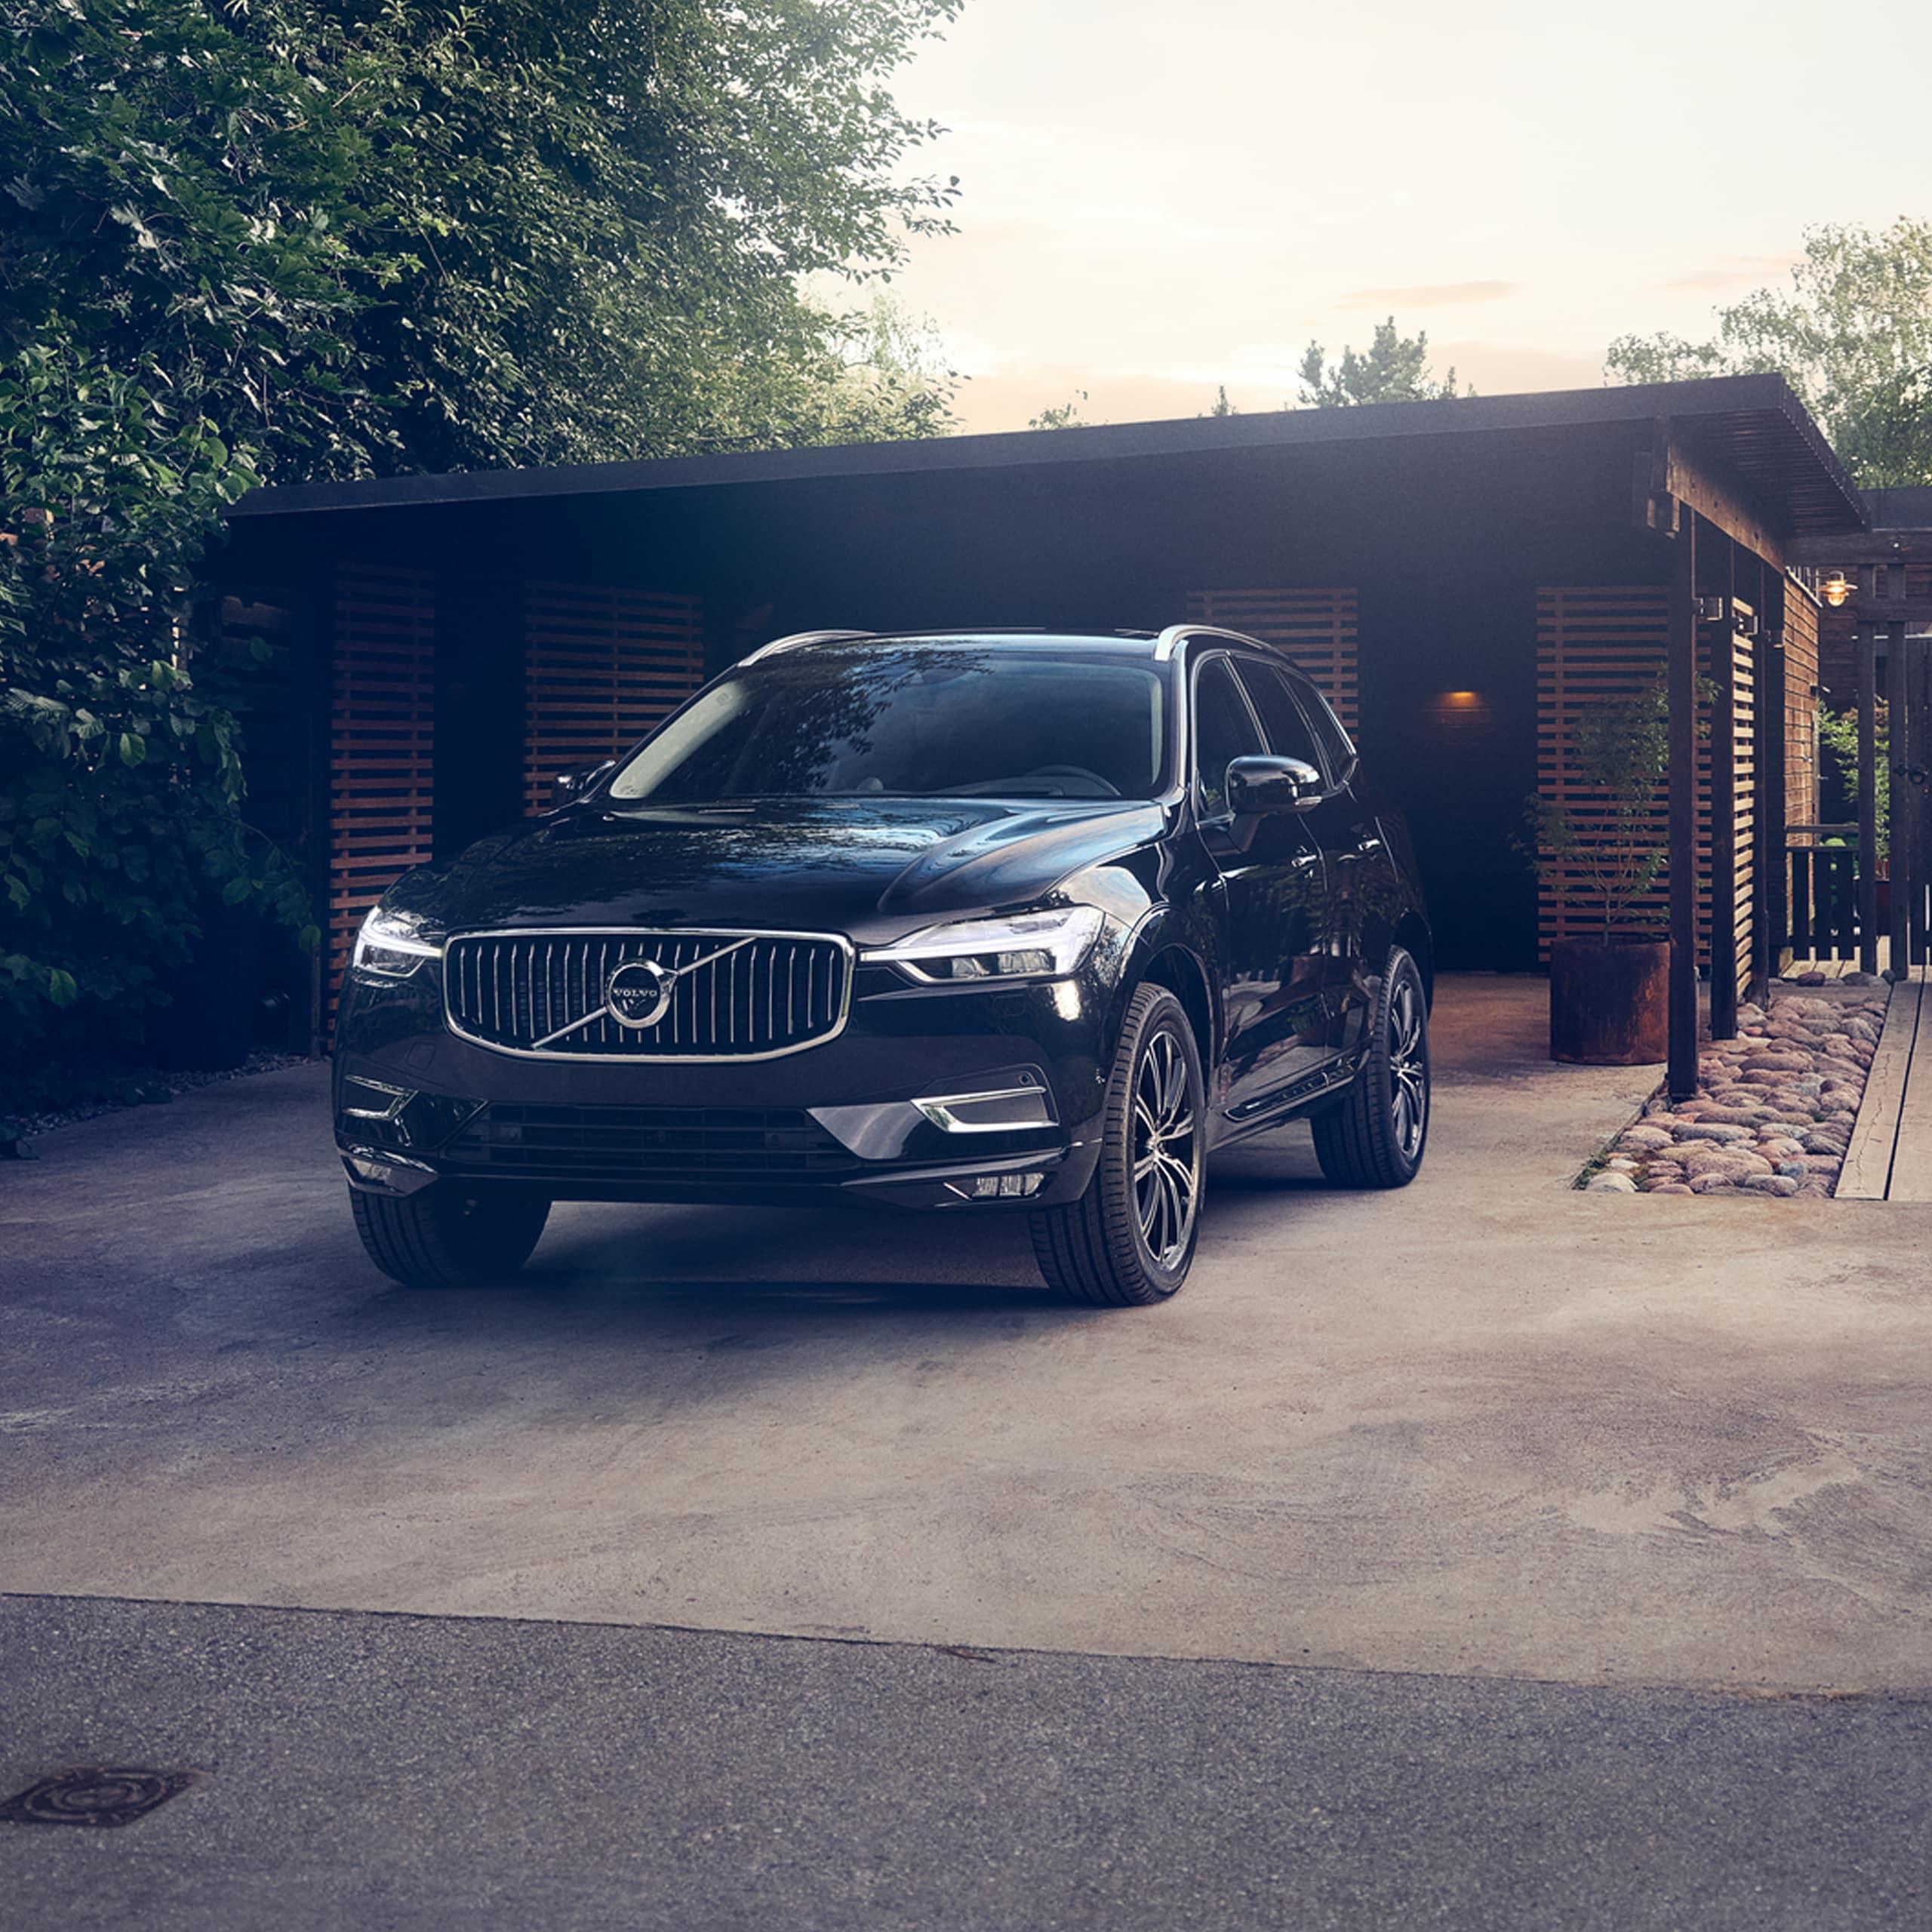 XC60 Fuel Promo Offer